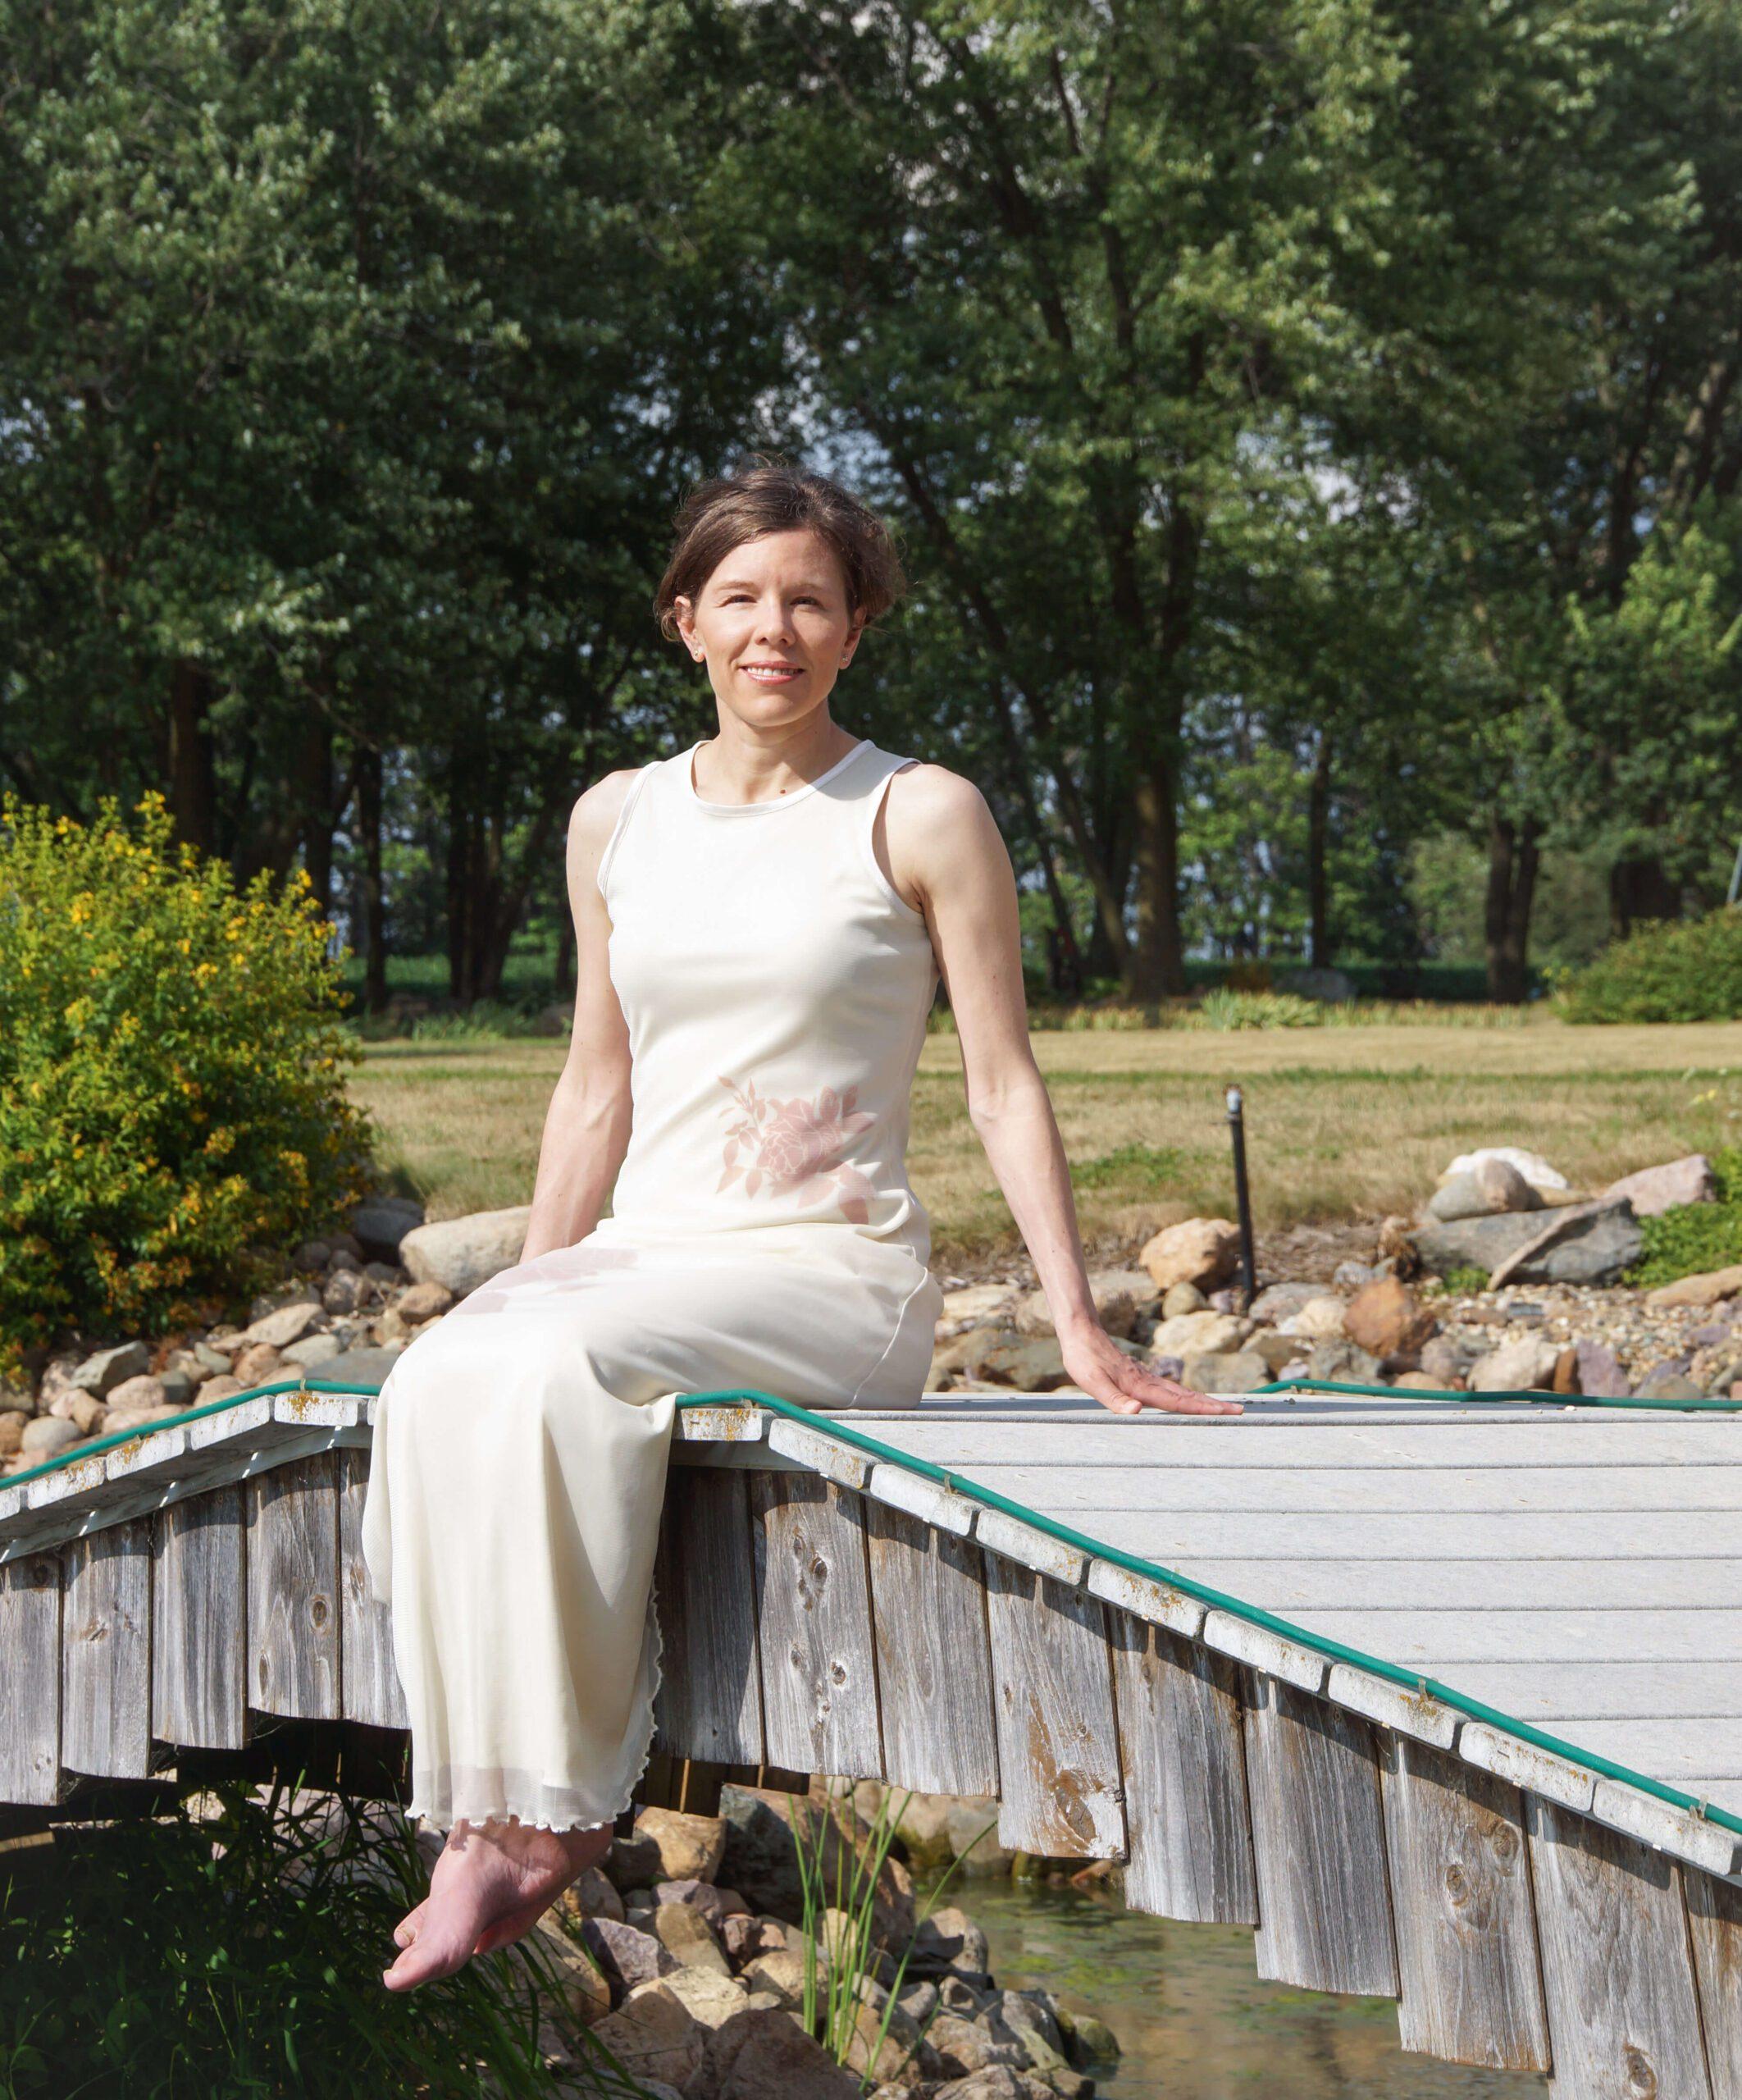 Farrah Fritz sitting on a wooden bridge